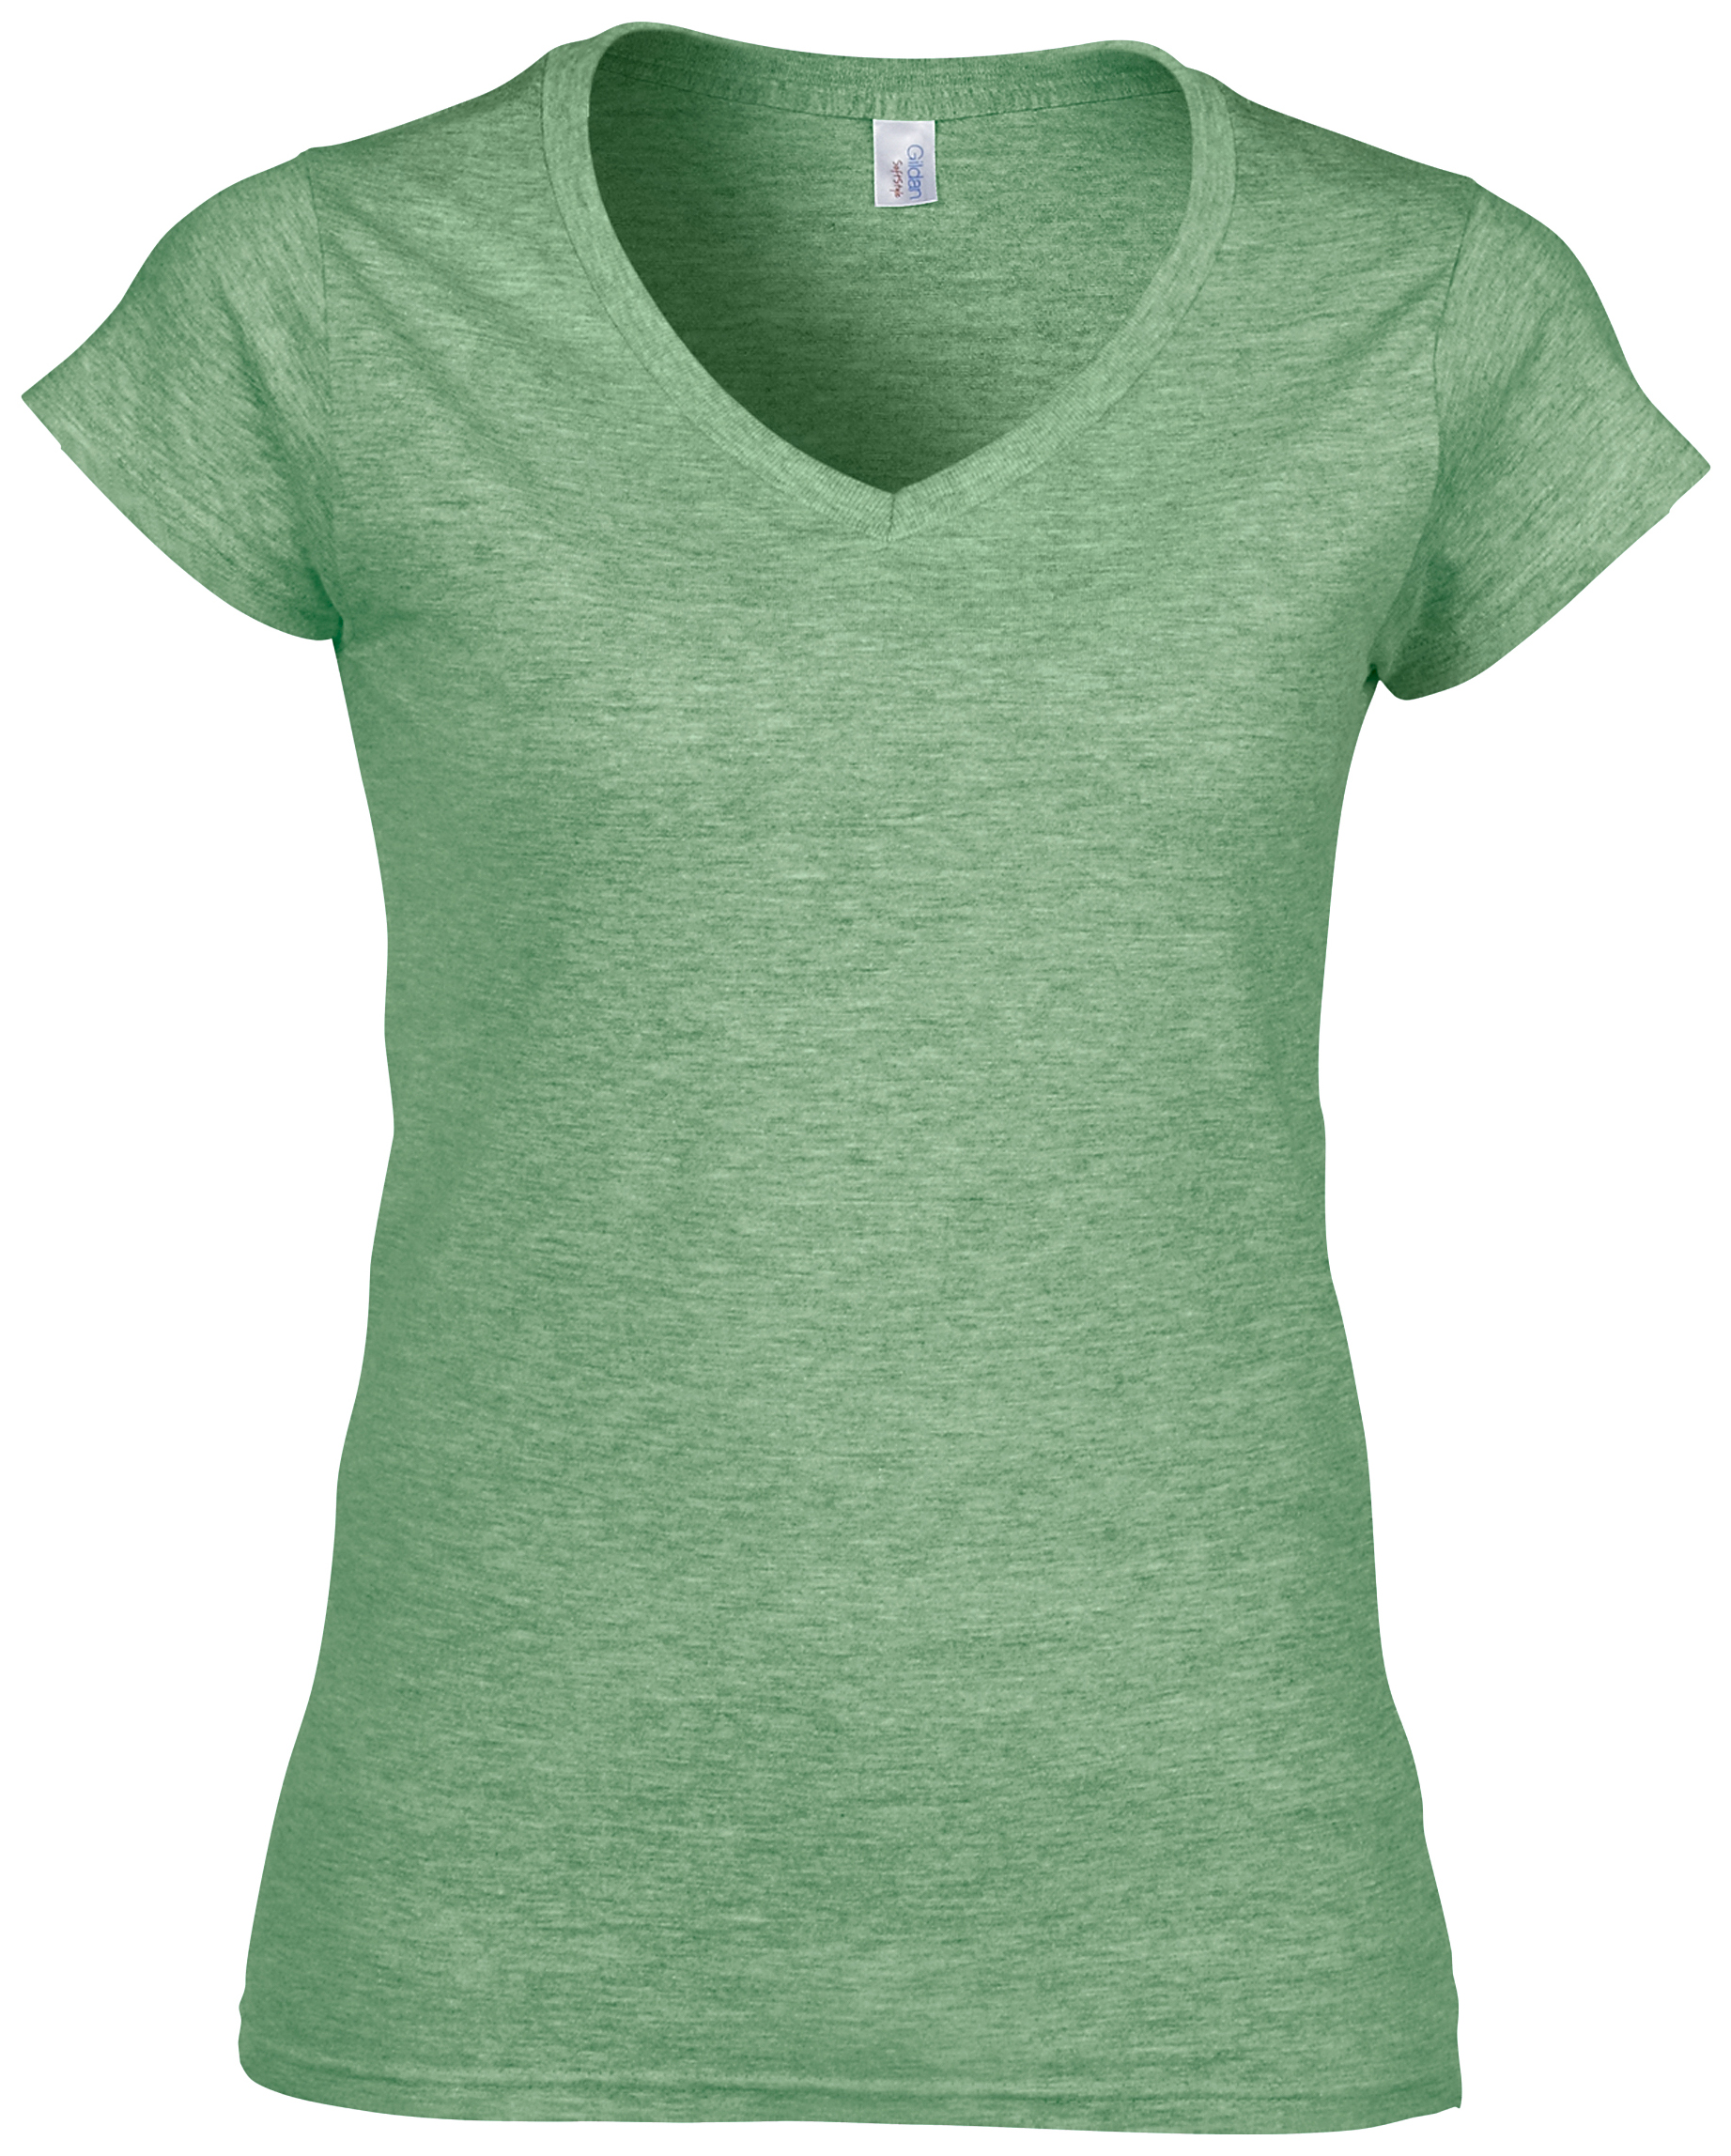 Gildan Softstyle® Women/'s V-Neck T-Shirt Casual Plain Blank T Cotton Jersey Tee